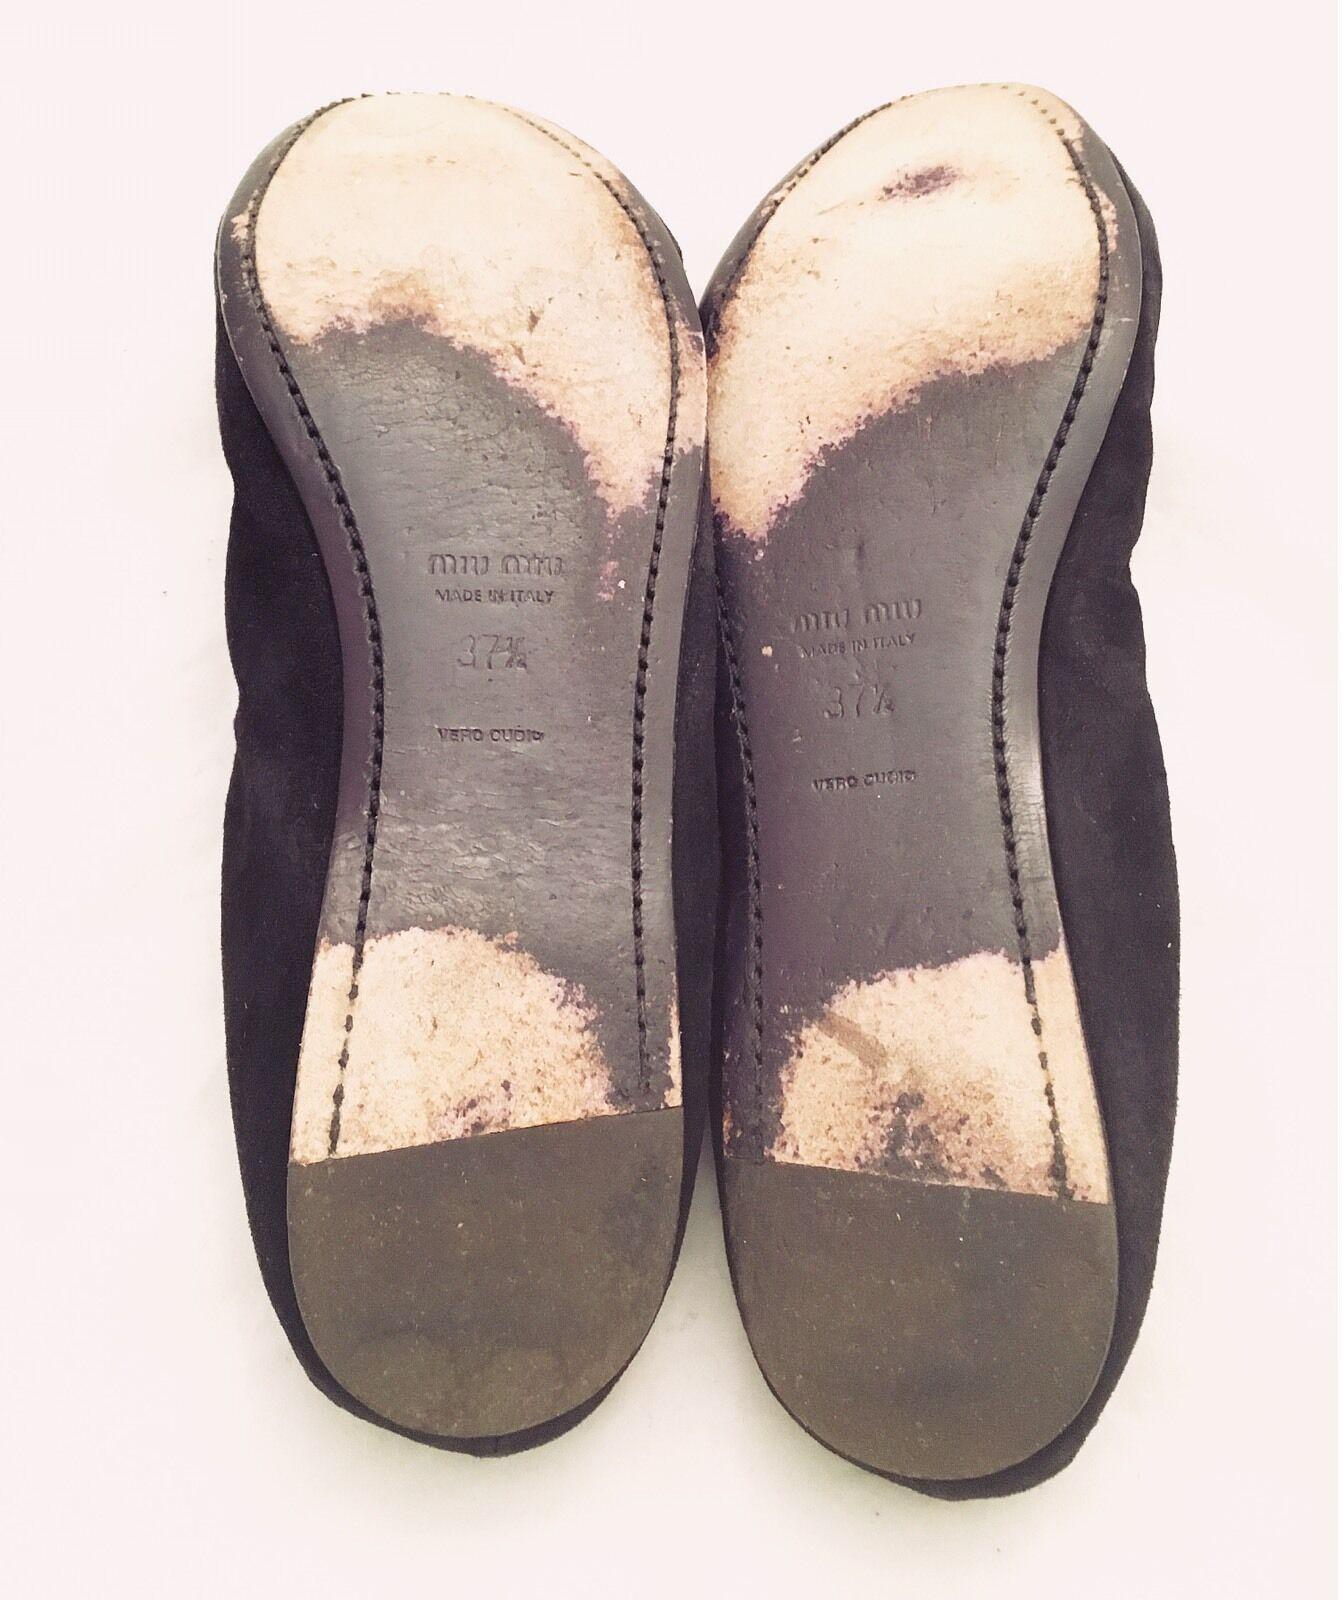 Womens - - - MIU MIU - Betelgeuse Black & Purple Velvet Suede Slipper Ballet Flats 7 83aad7